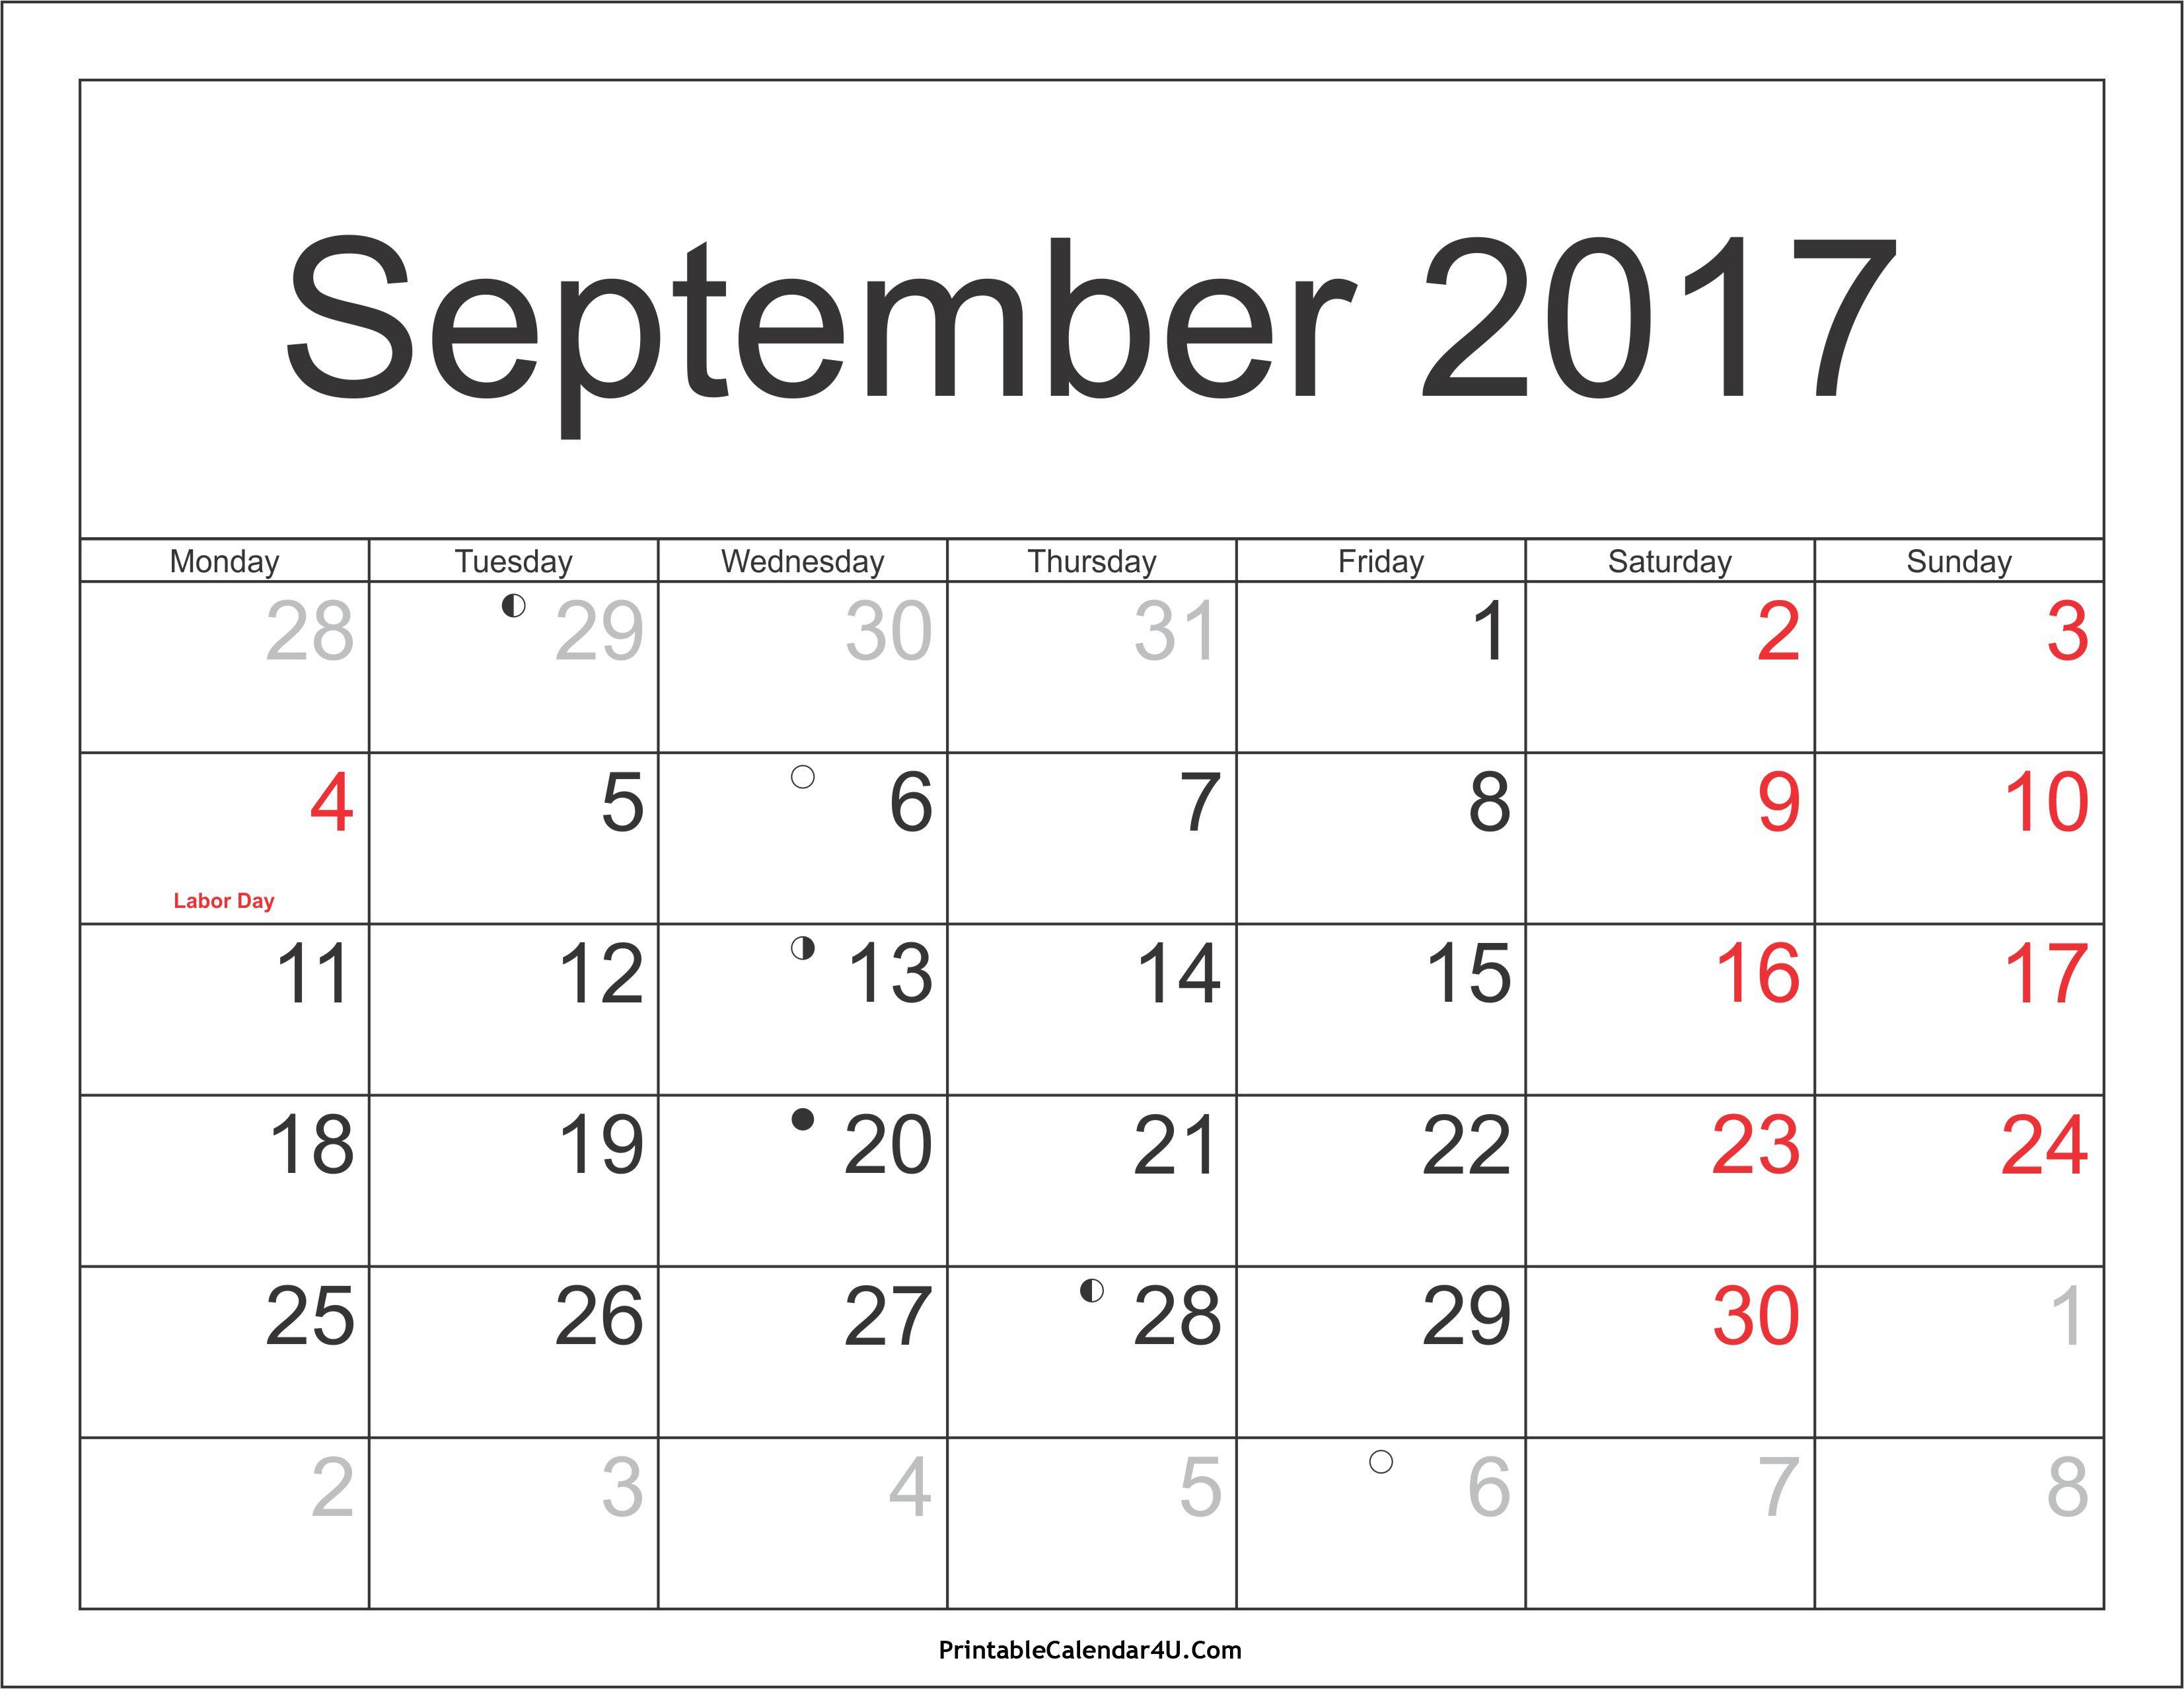 Pincalendar Printable On September 2017 Calendar